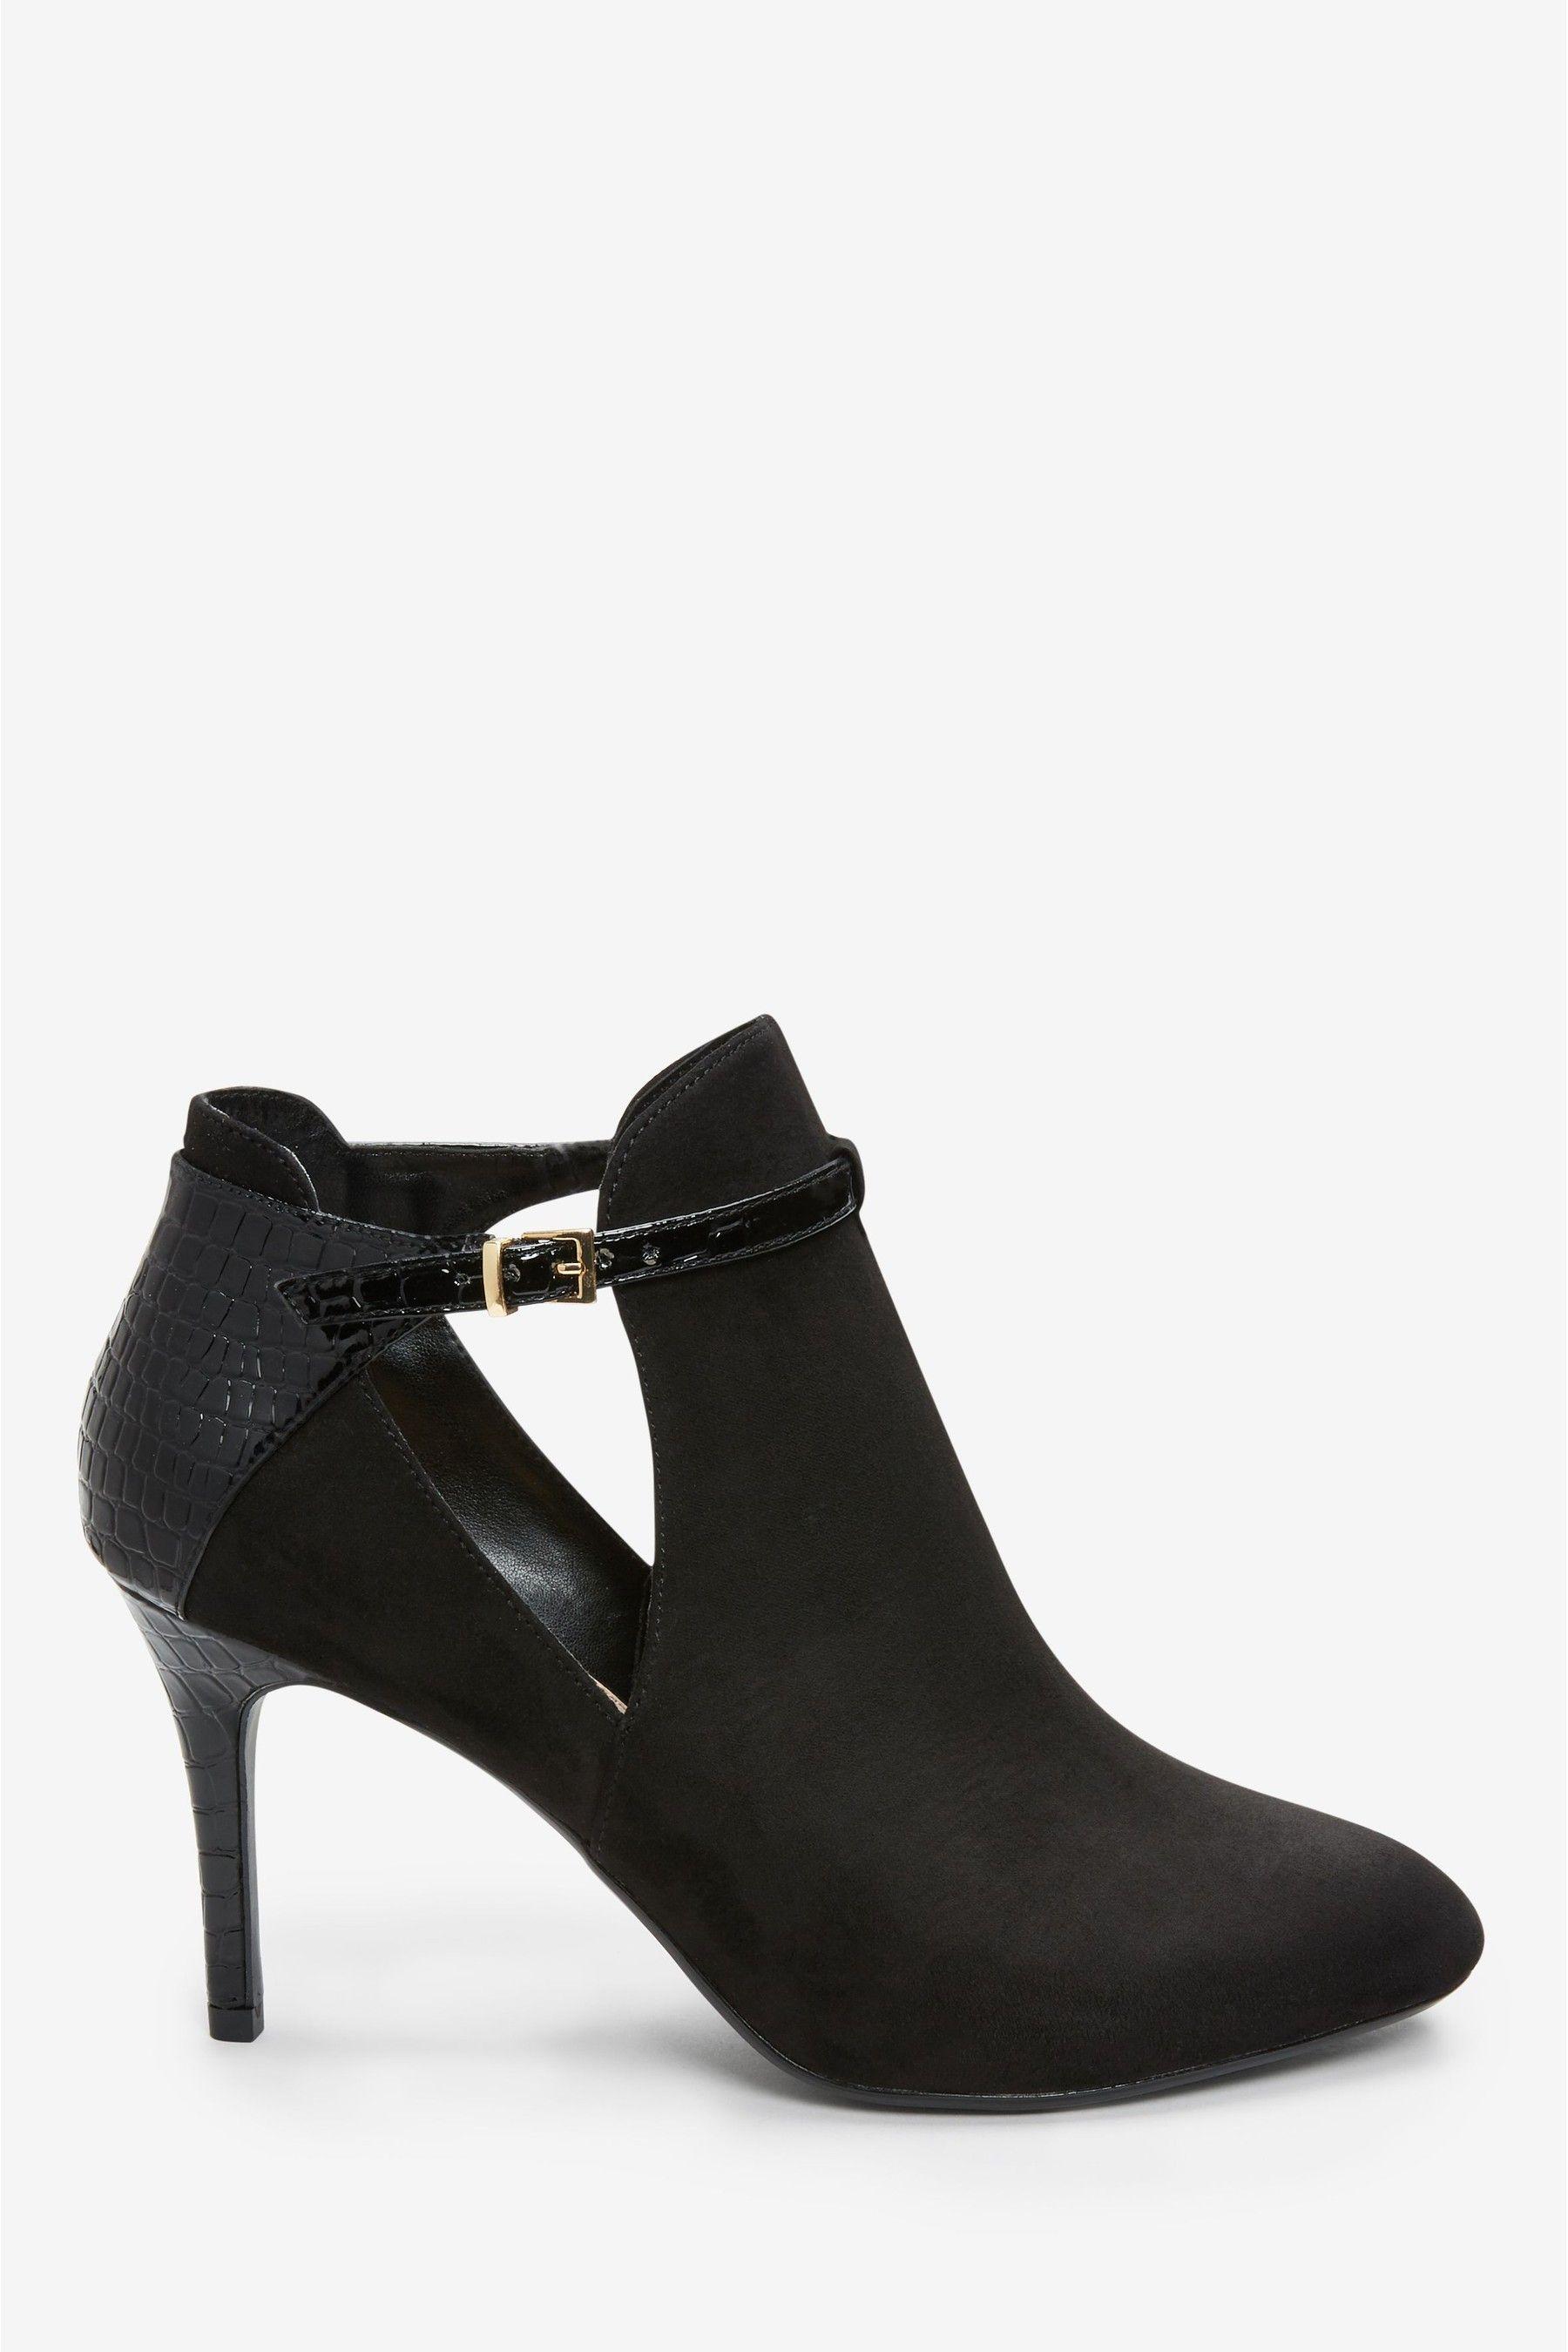 High heel shoe boots, Shoe boots